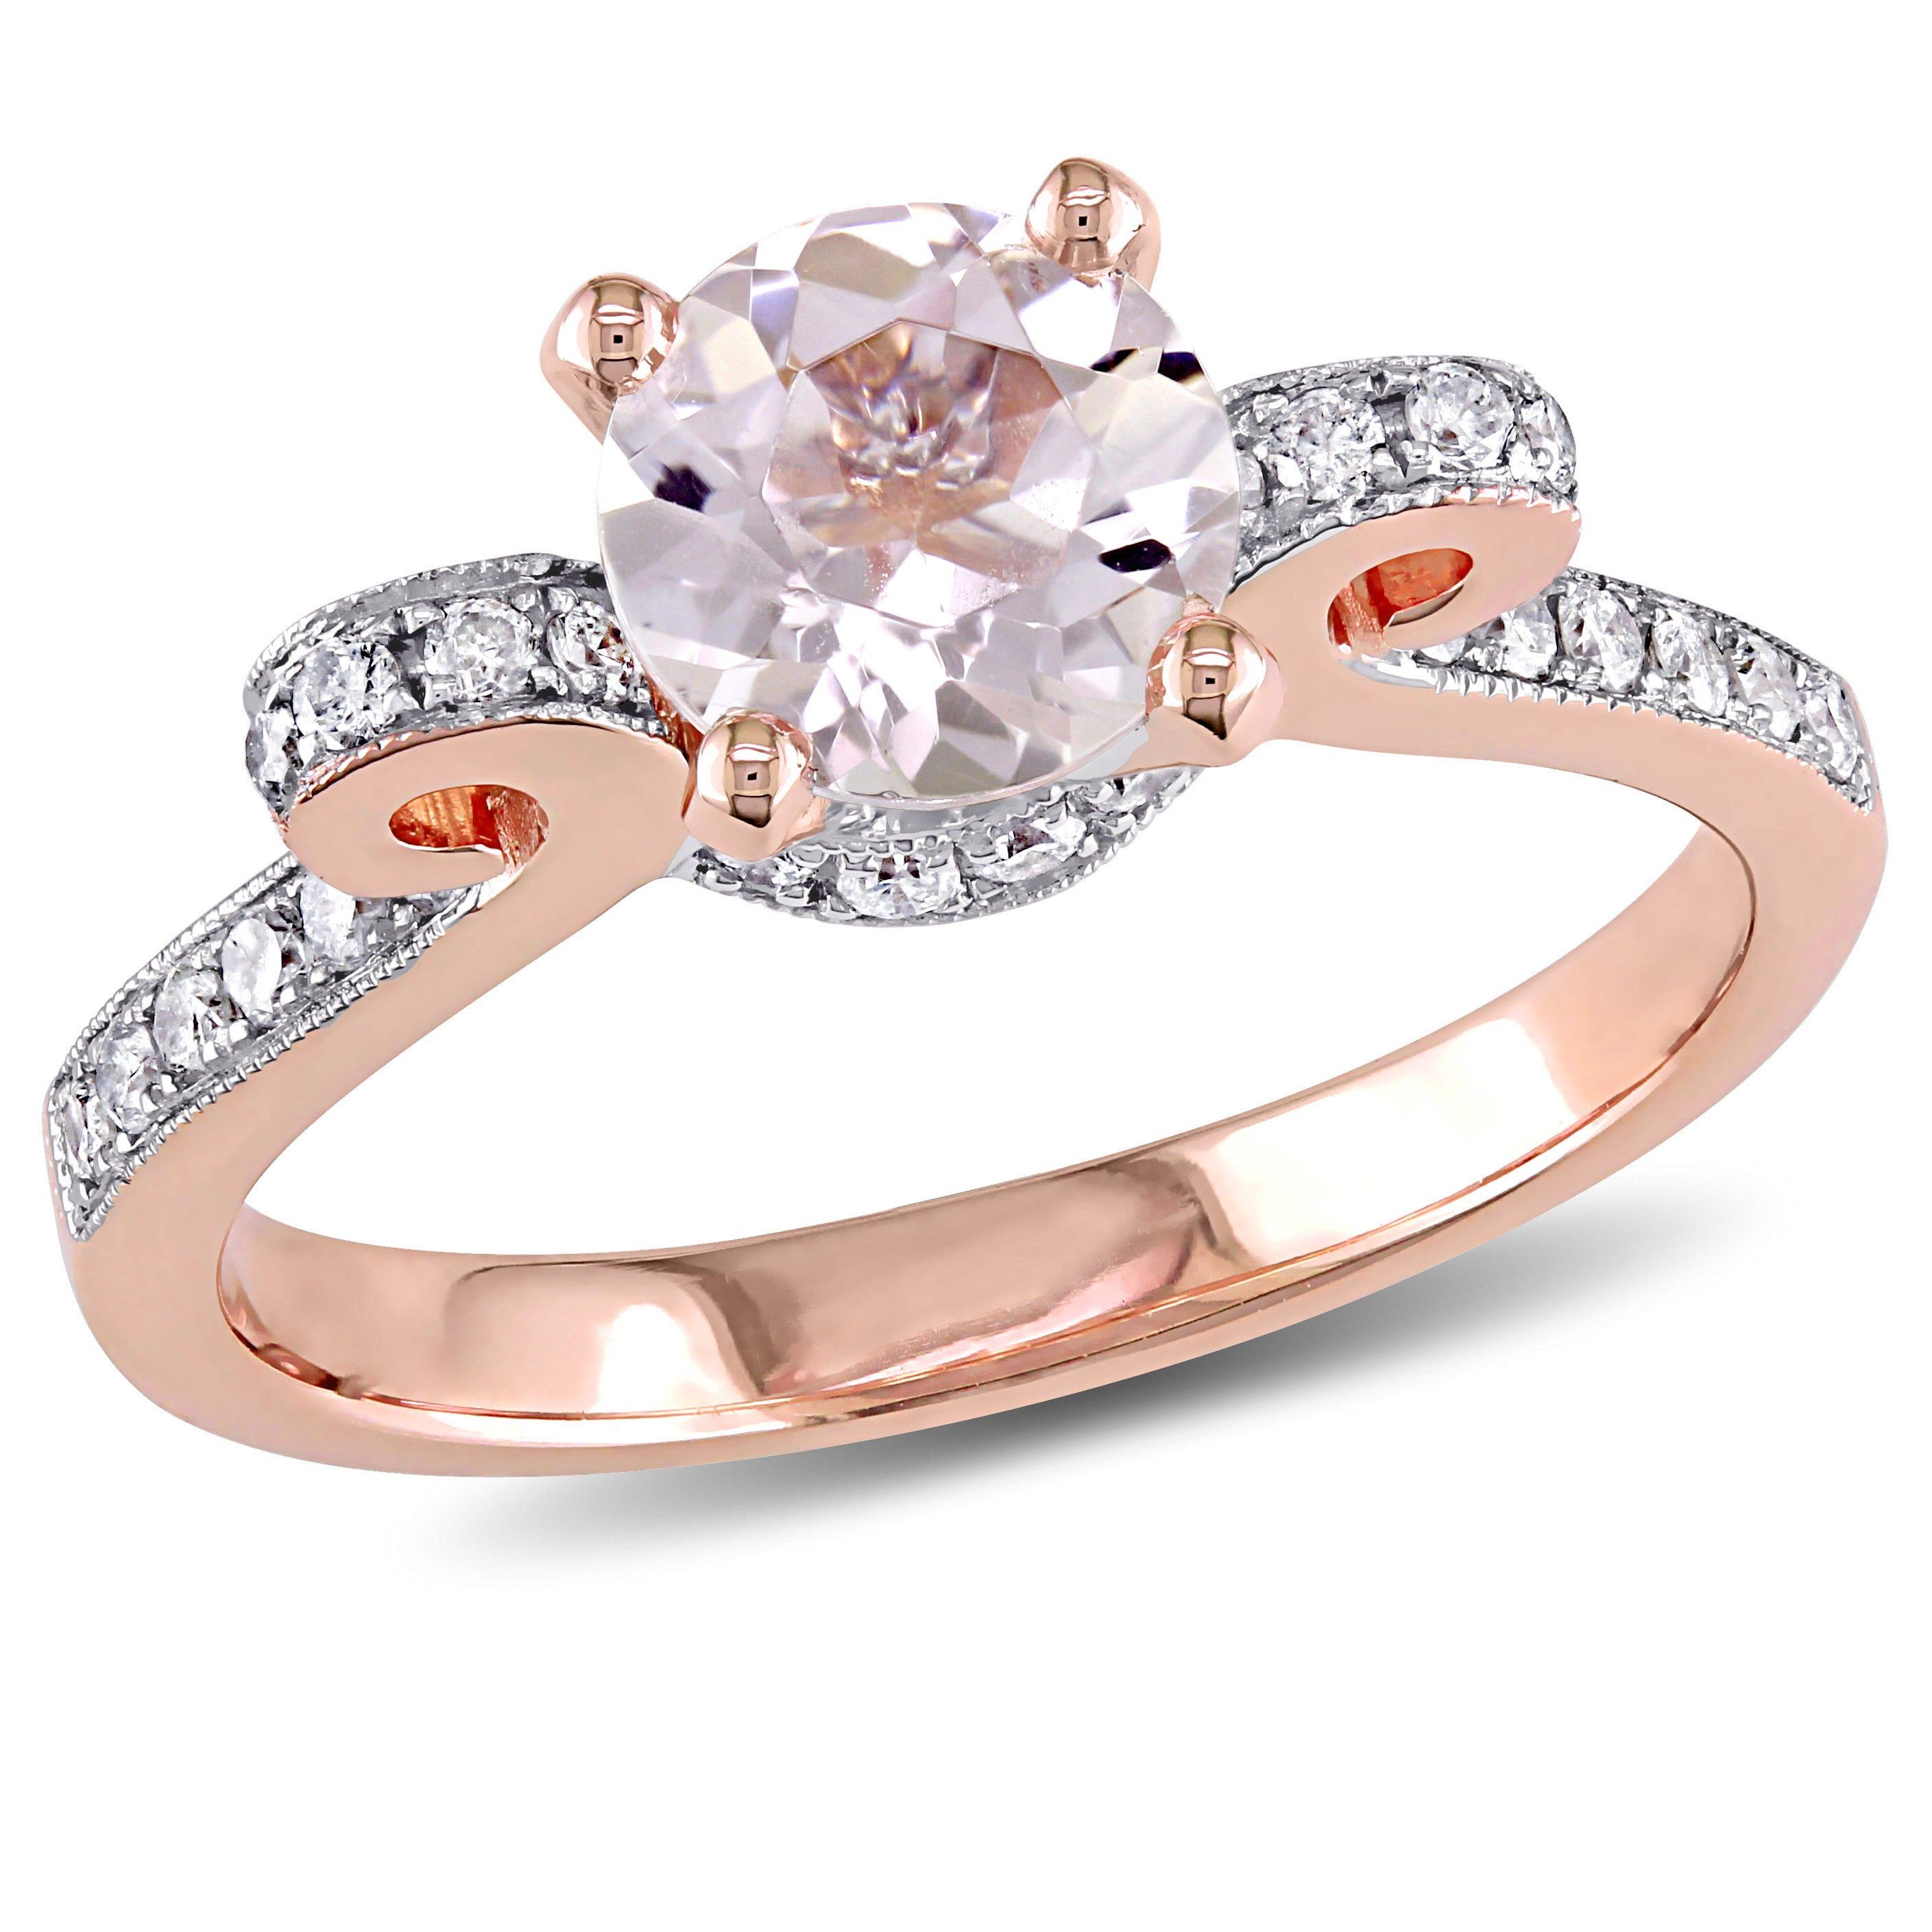 Round Morganite Bow-Design Diamond Engagement Ring in 14k Rose Gold